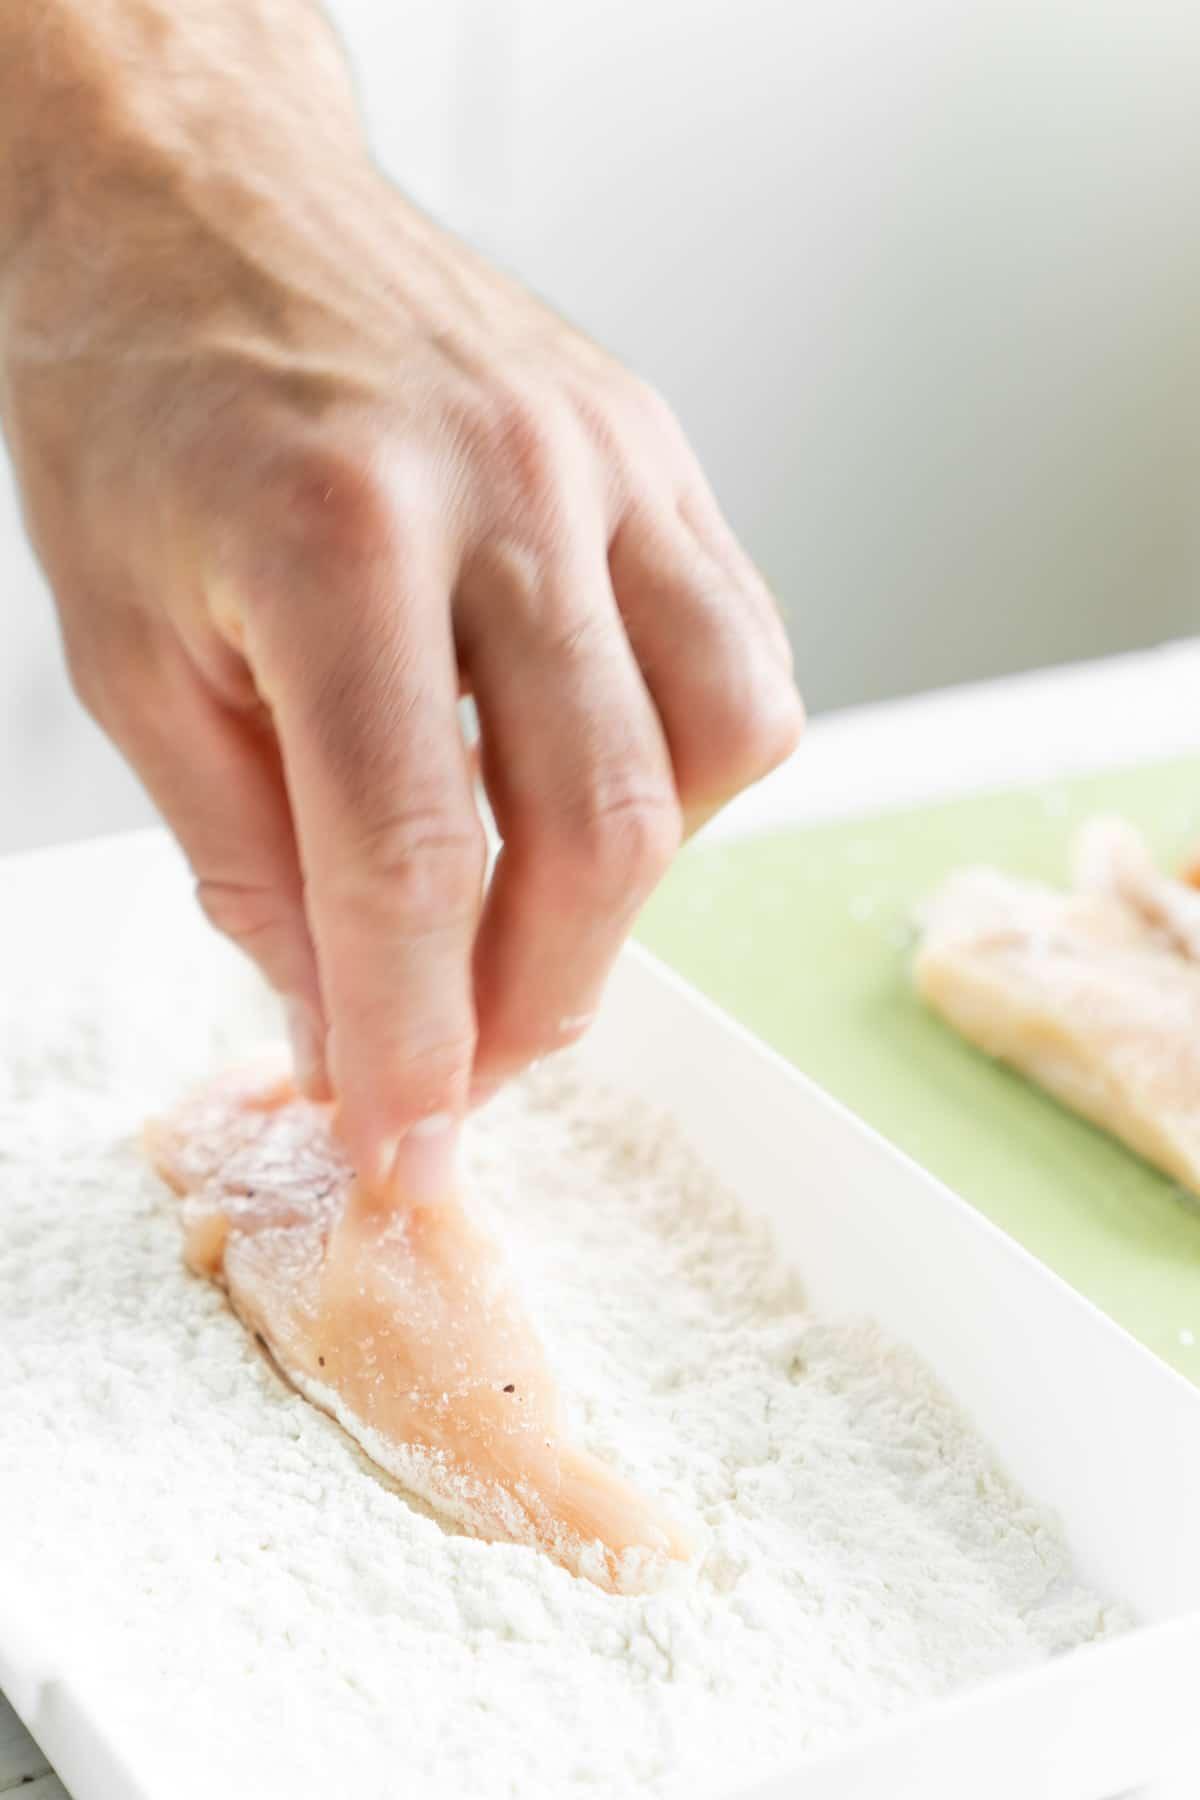 Hand putting chicken tender into dish of flour